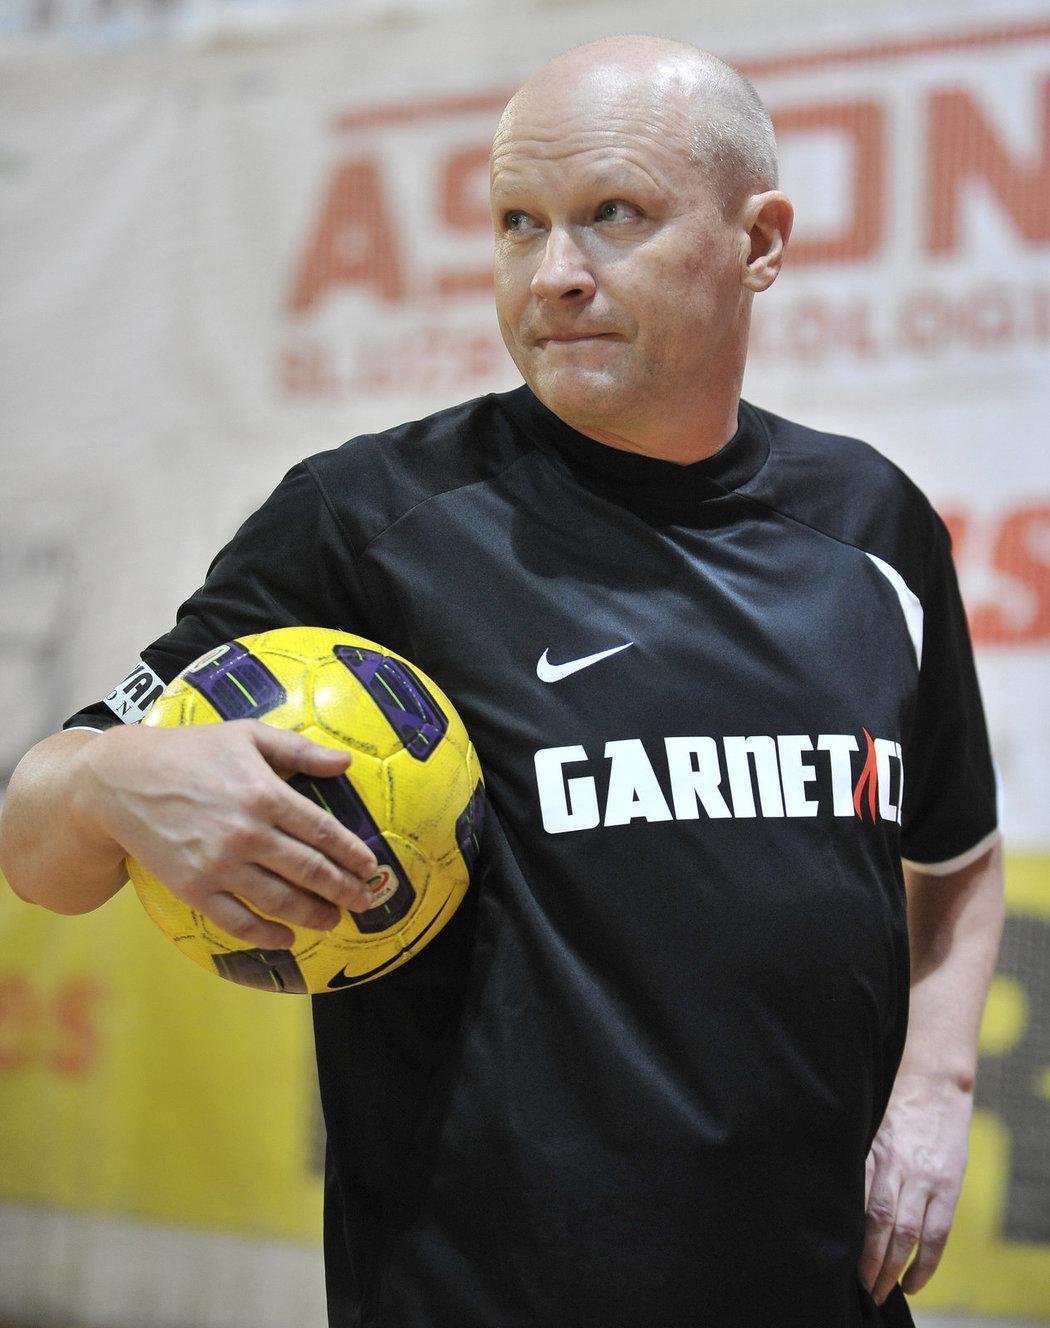 Ivan Hašek na snímku z turnaje internacionálu z roku 2010